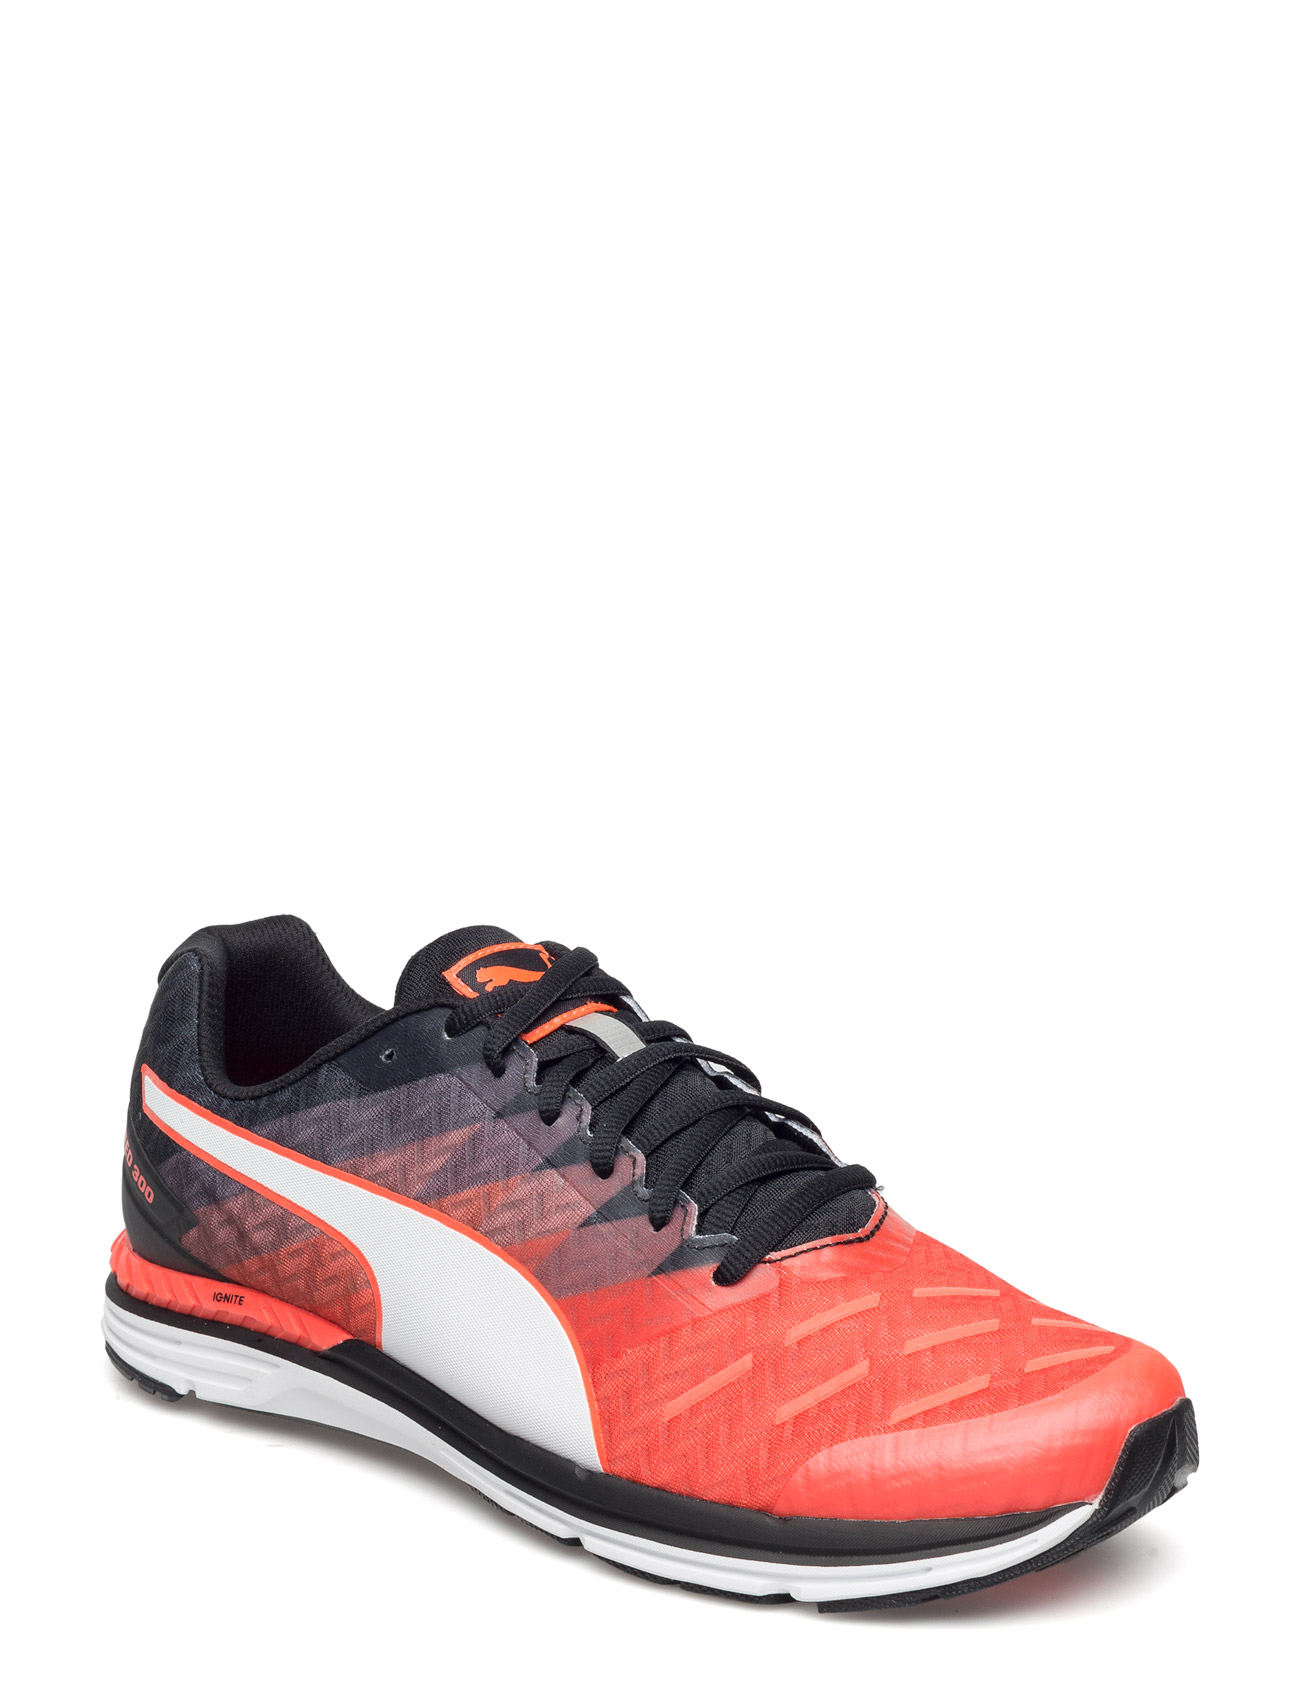 Speed 300 Ignite PUMA SPORT Sports sko til Herrer i